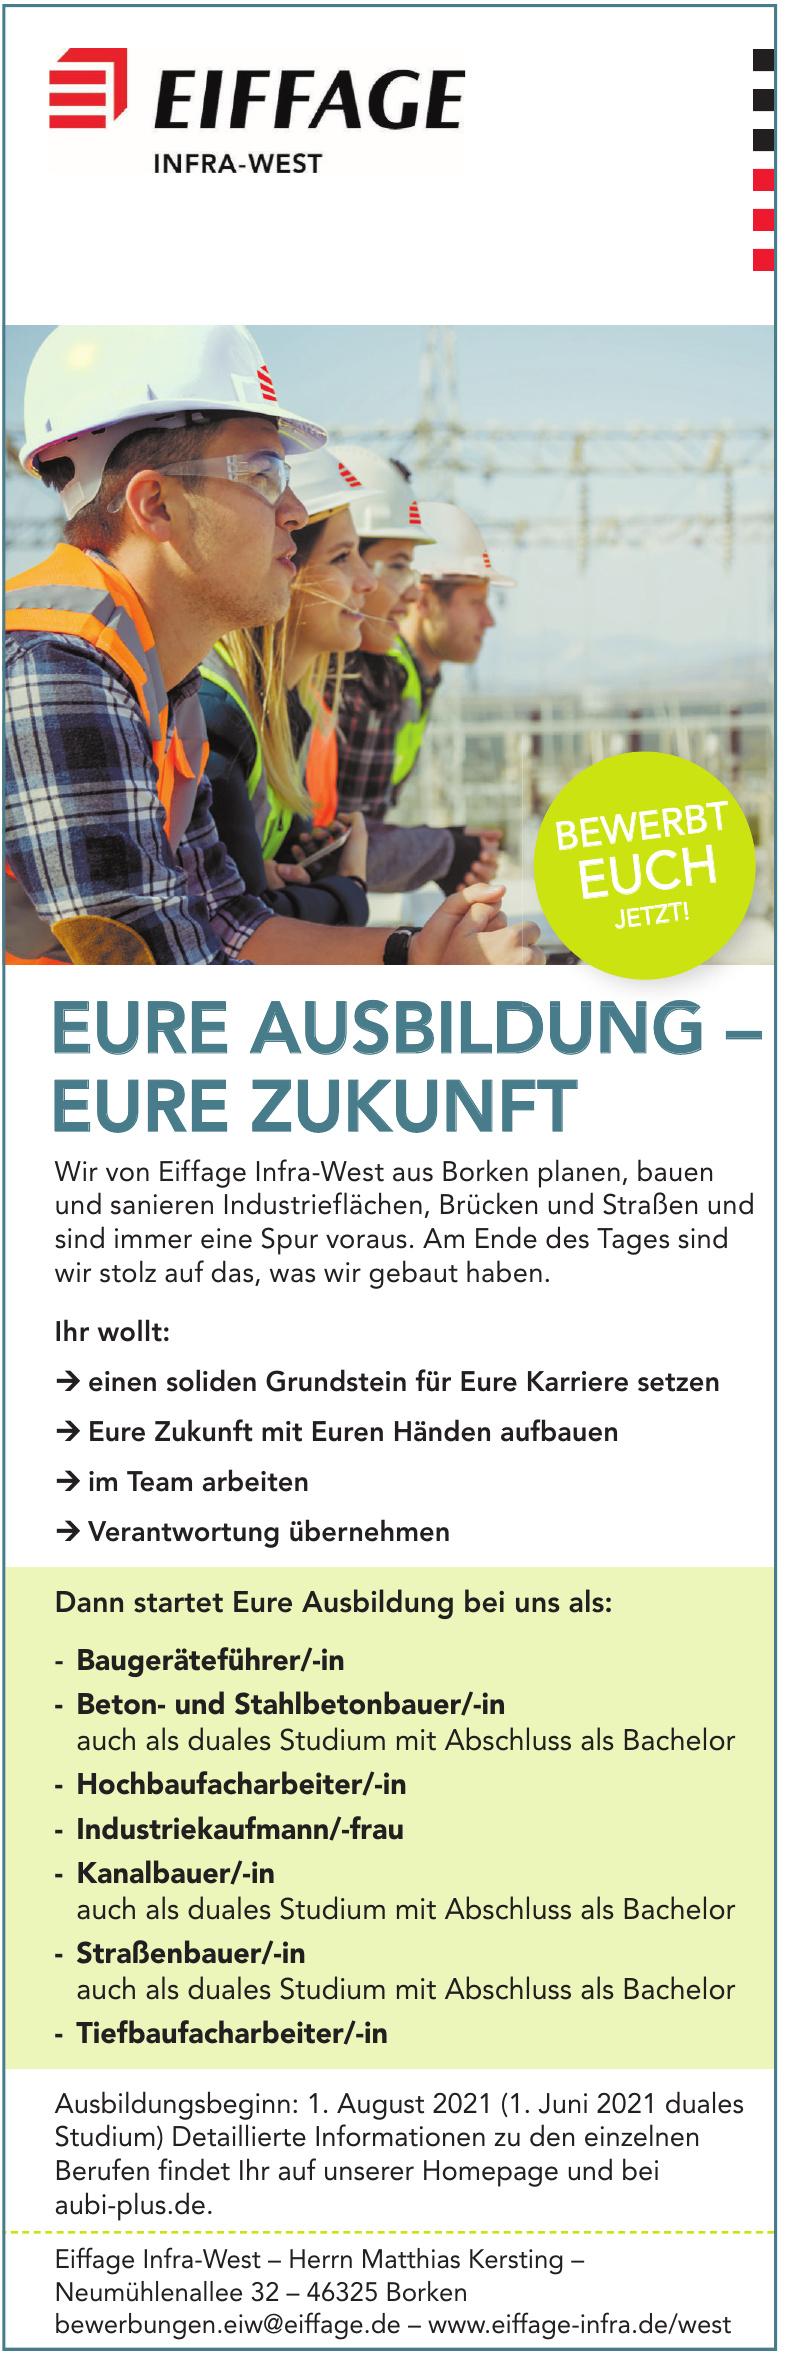 Eiffage Infra-West